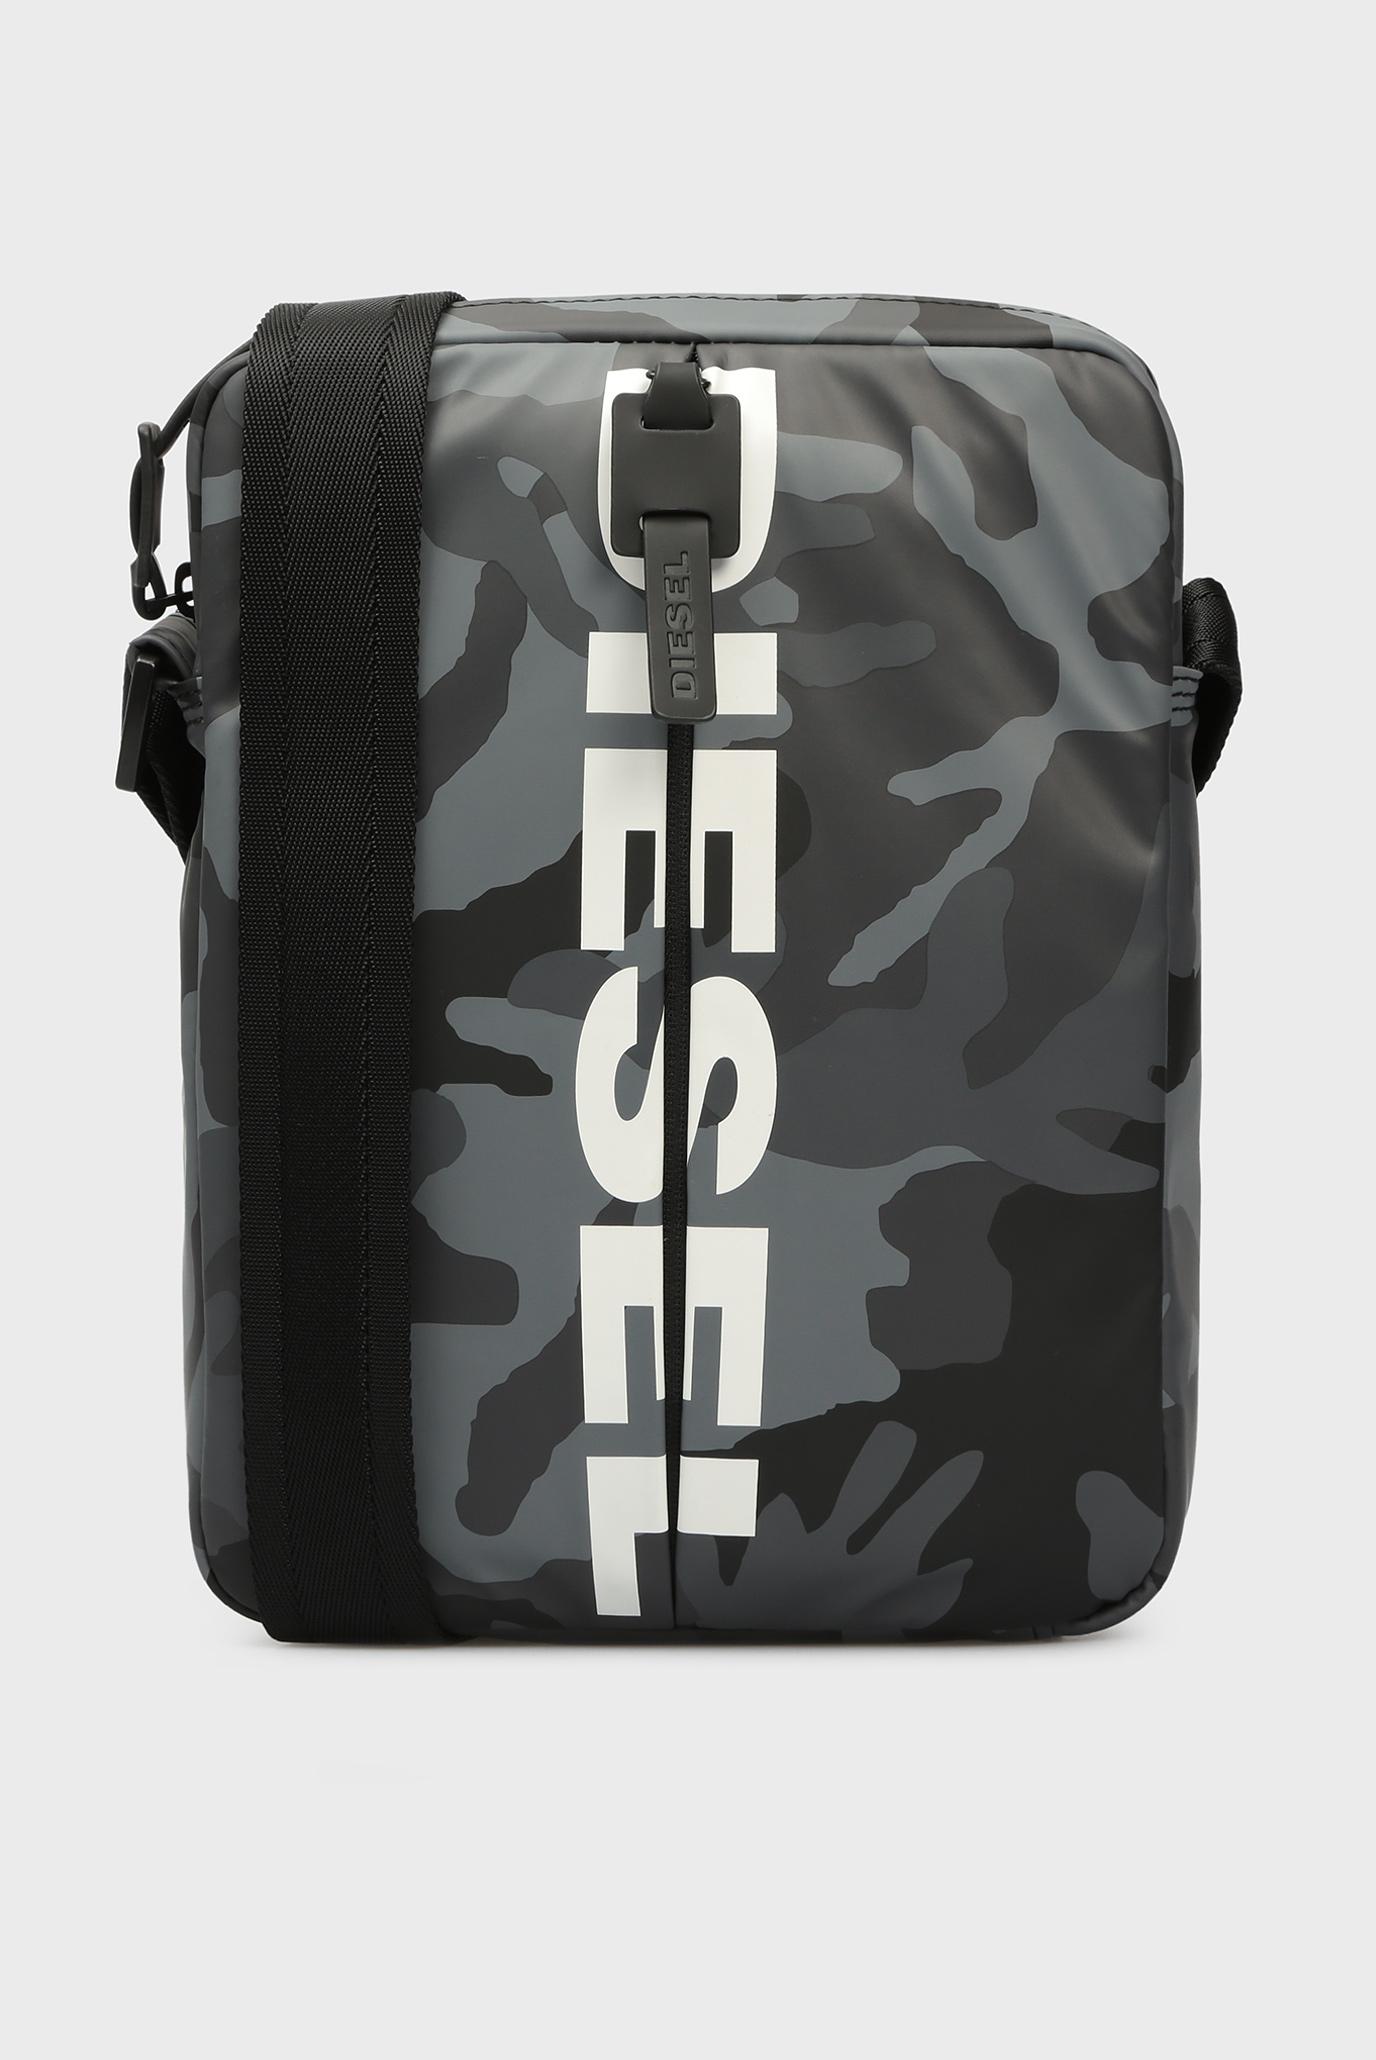 97fd3bc04507 Купить Мужская серая сумка через плечо BOLDMESSAGE Diesel Diesel ...